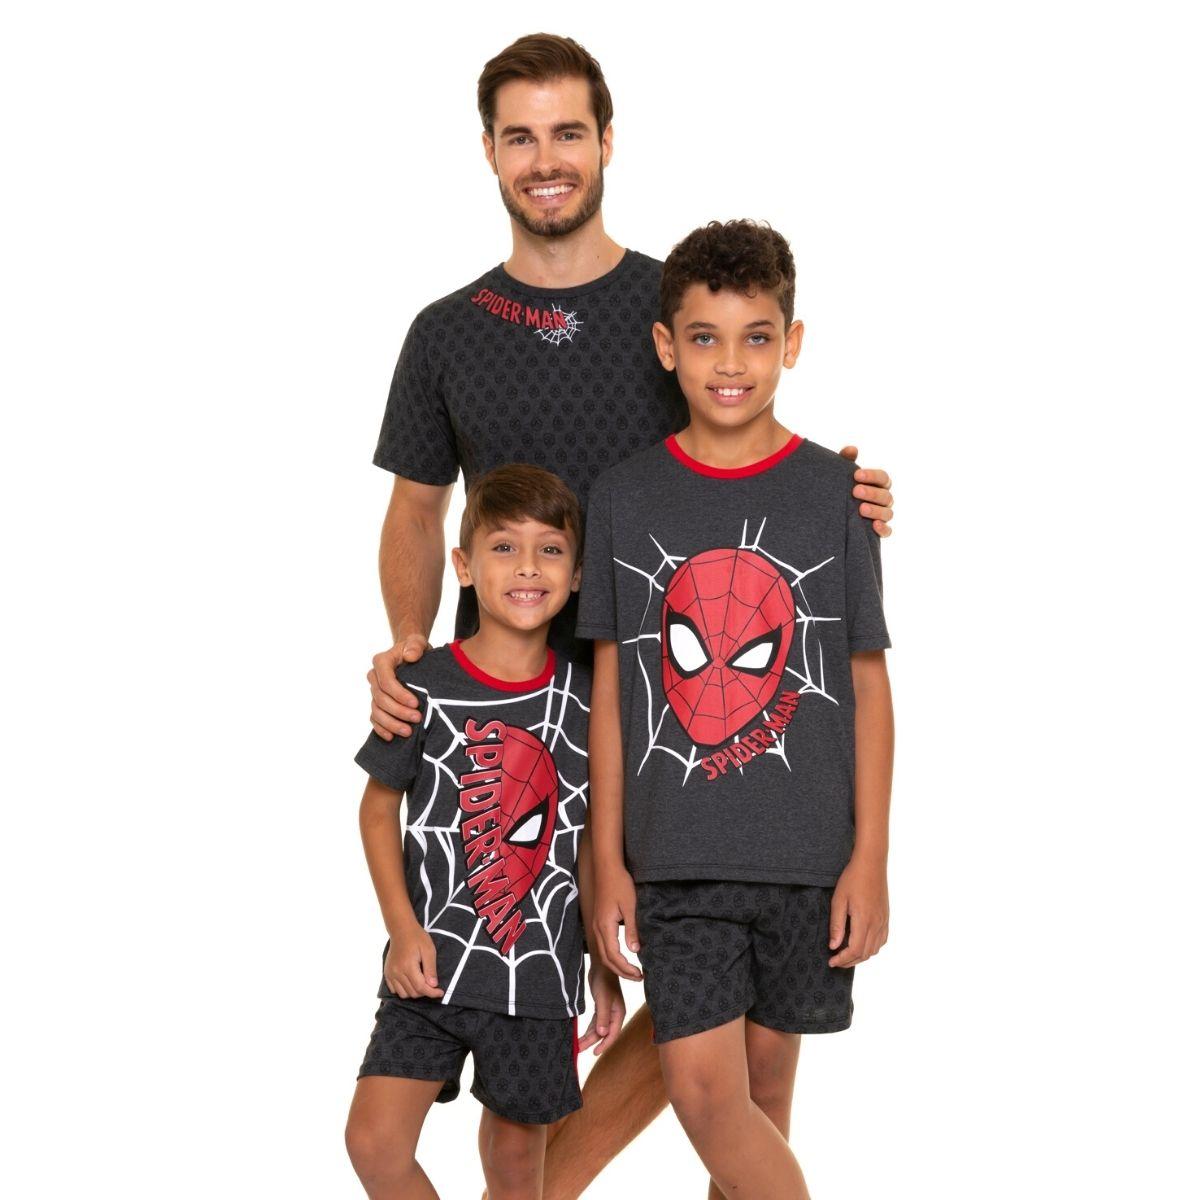 Pijama spider man masculino adulto curto de verão